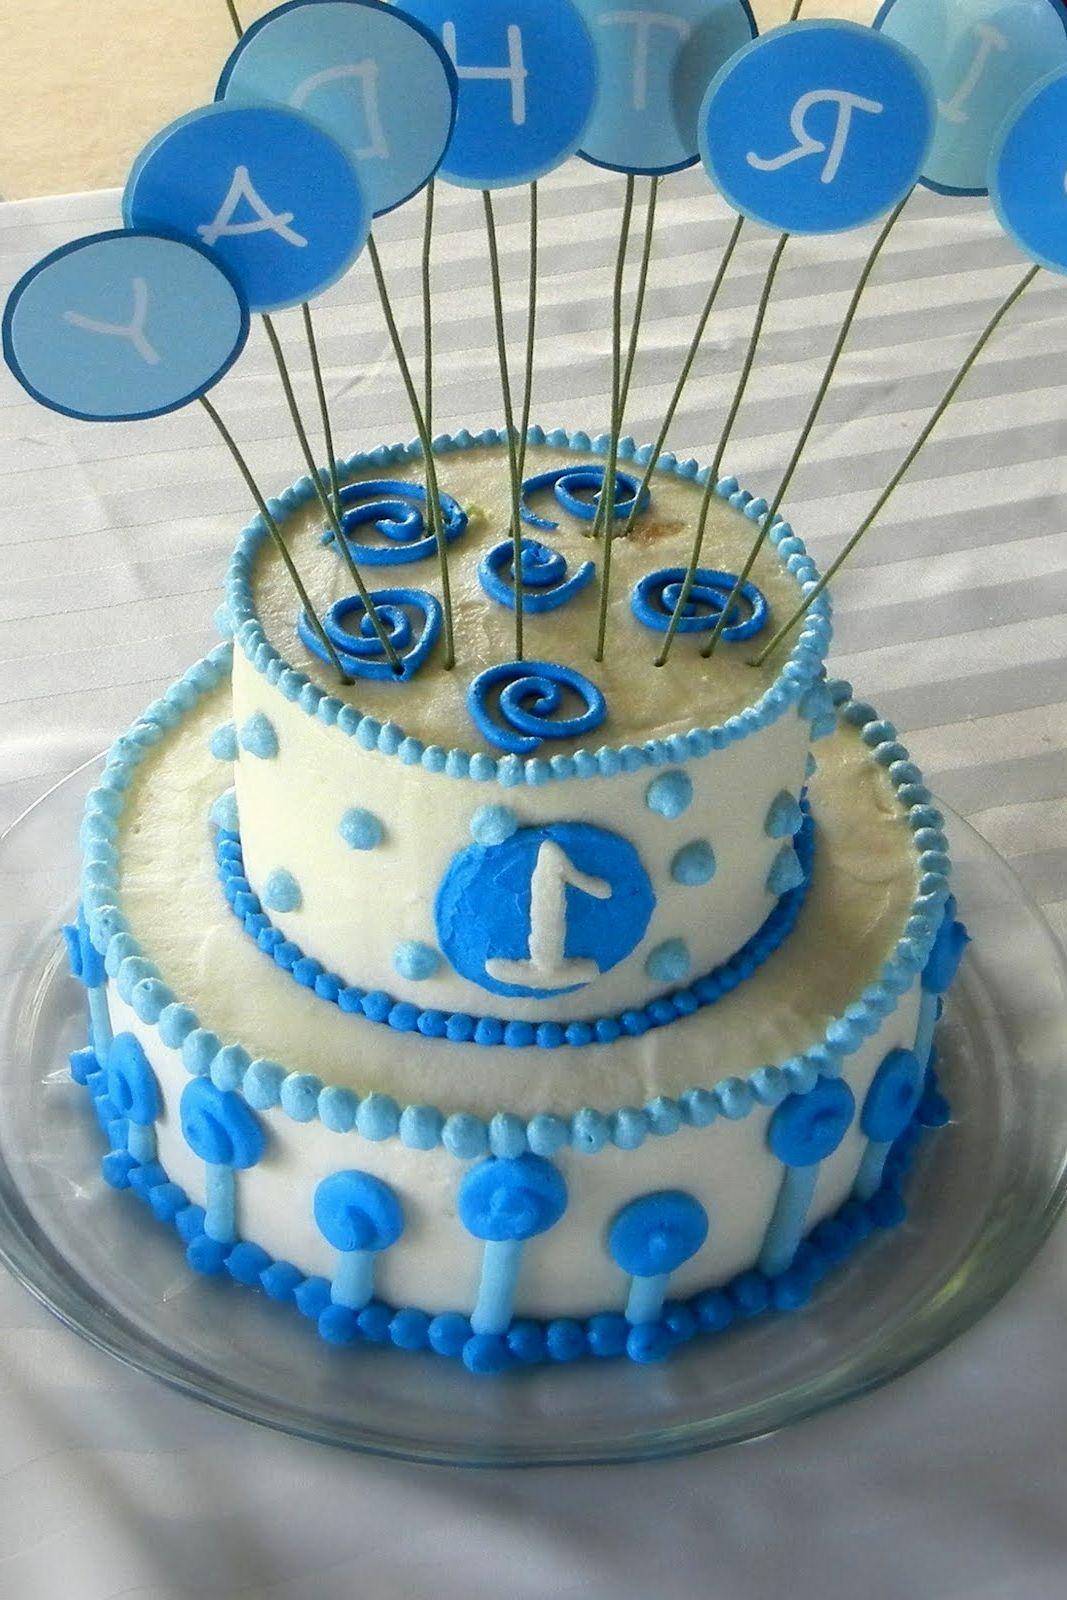 Simple Birthday Cake Design For Baby Boy